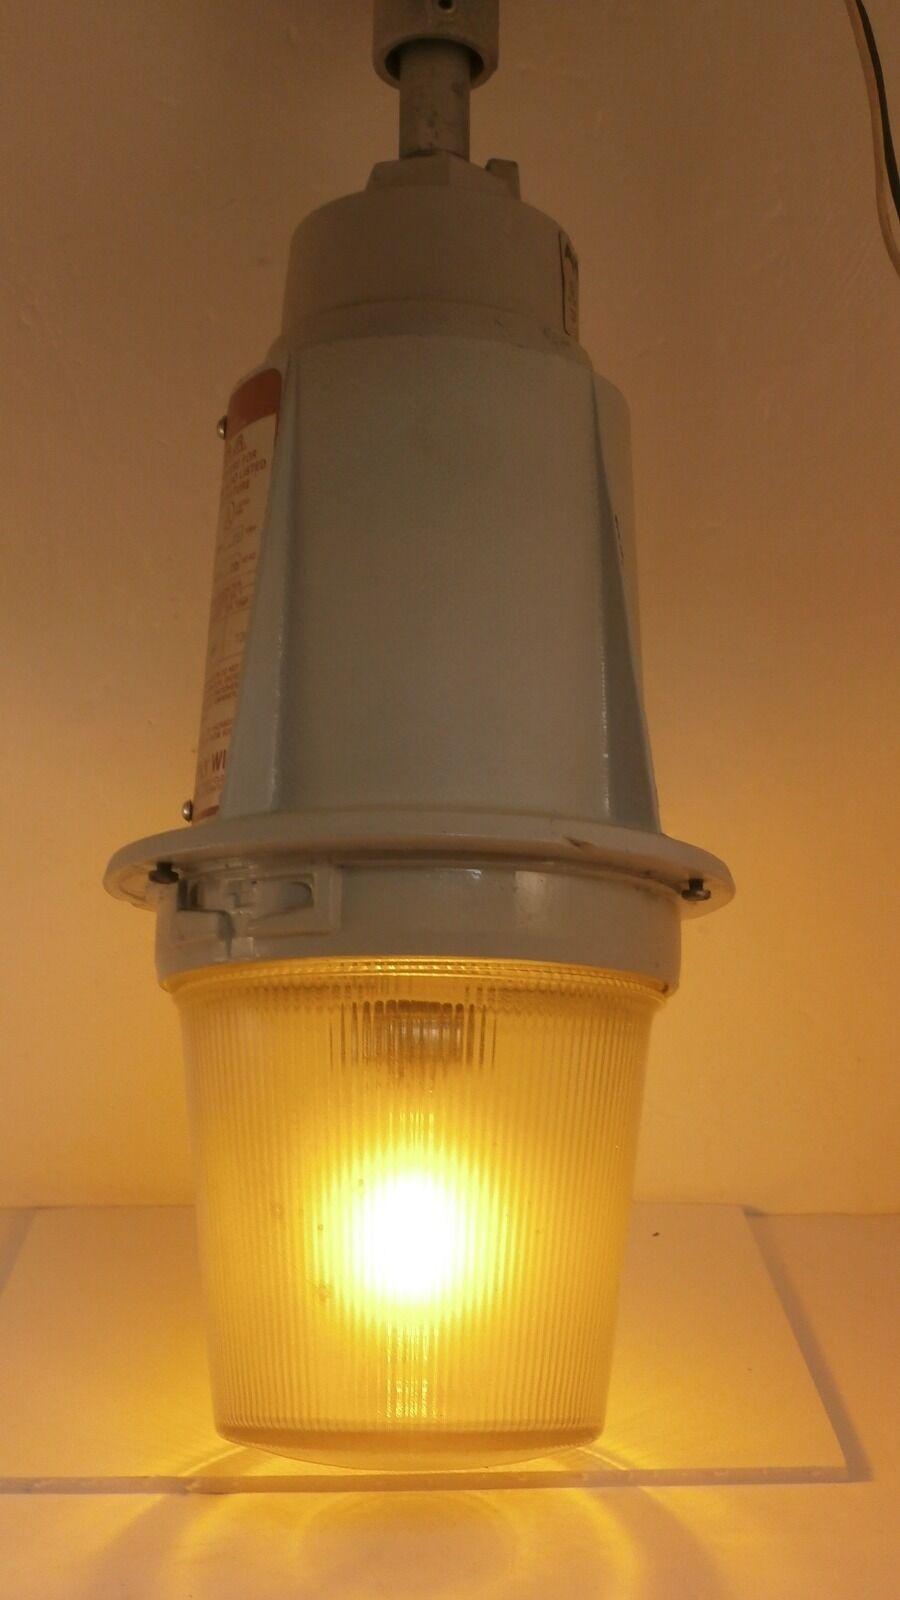 Appleton hps hazardous locations light fixture 70 watt ballast 120 resntentobalflowflowcomponenttechnicalissues arubaitofo Gallery